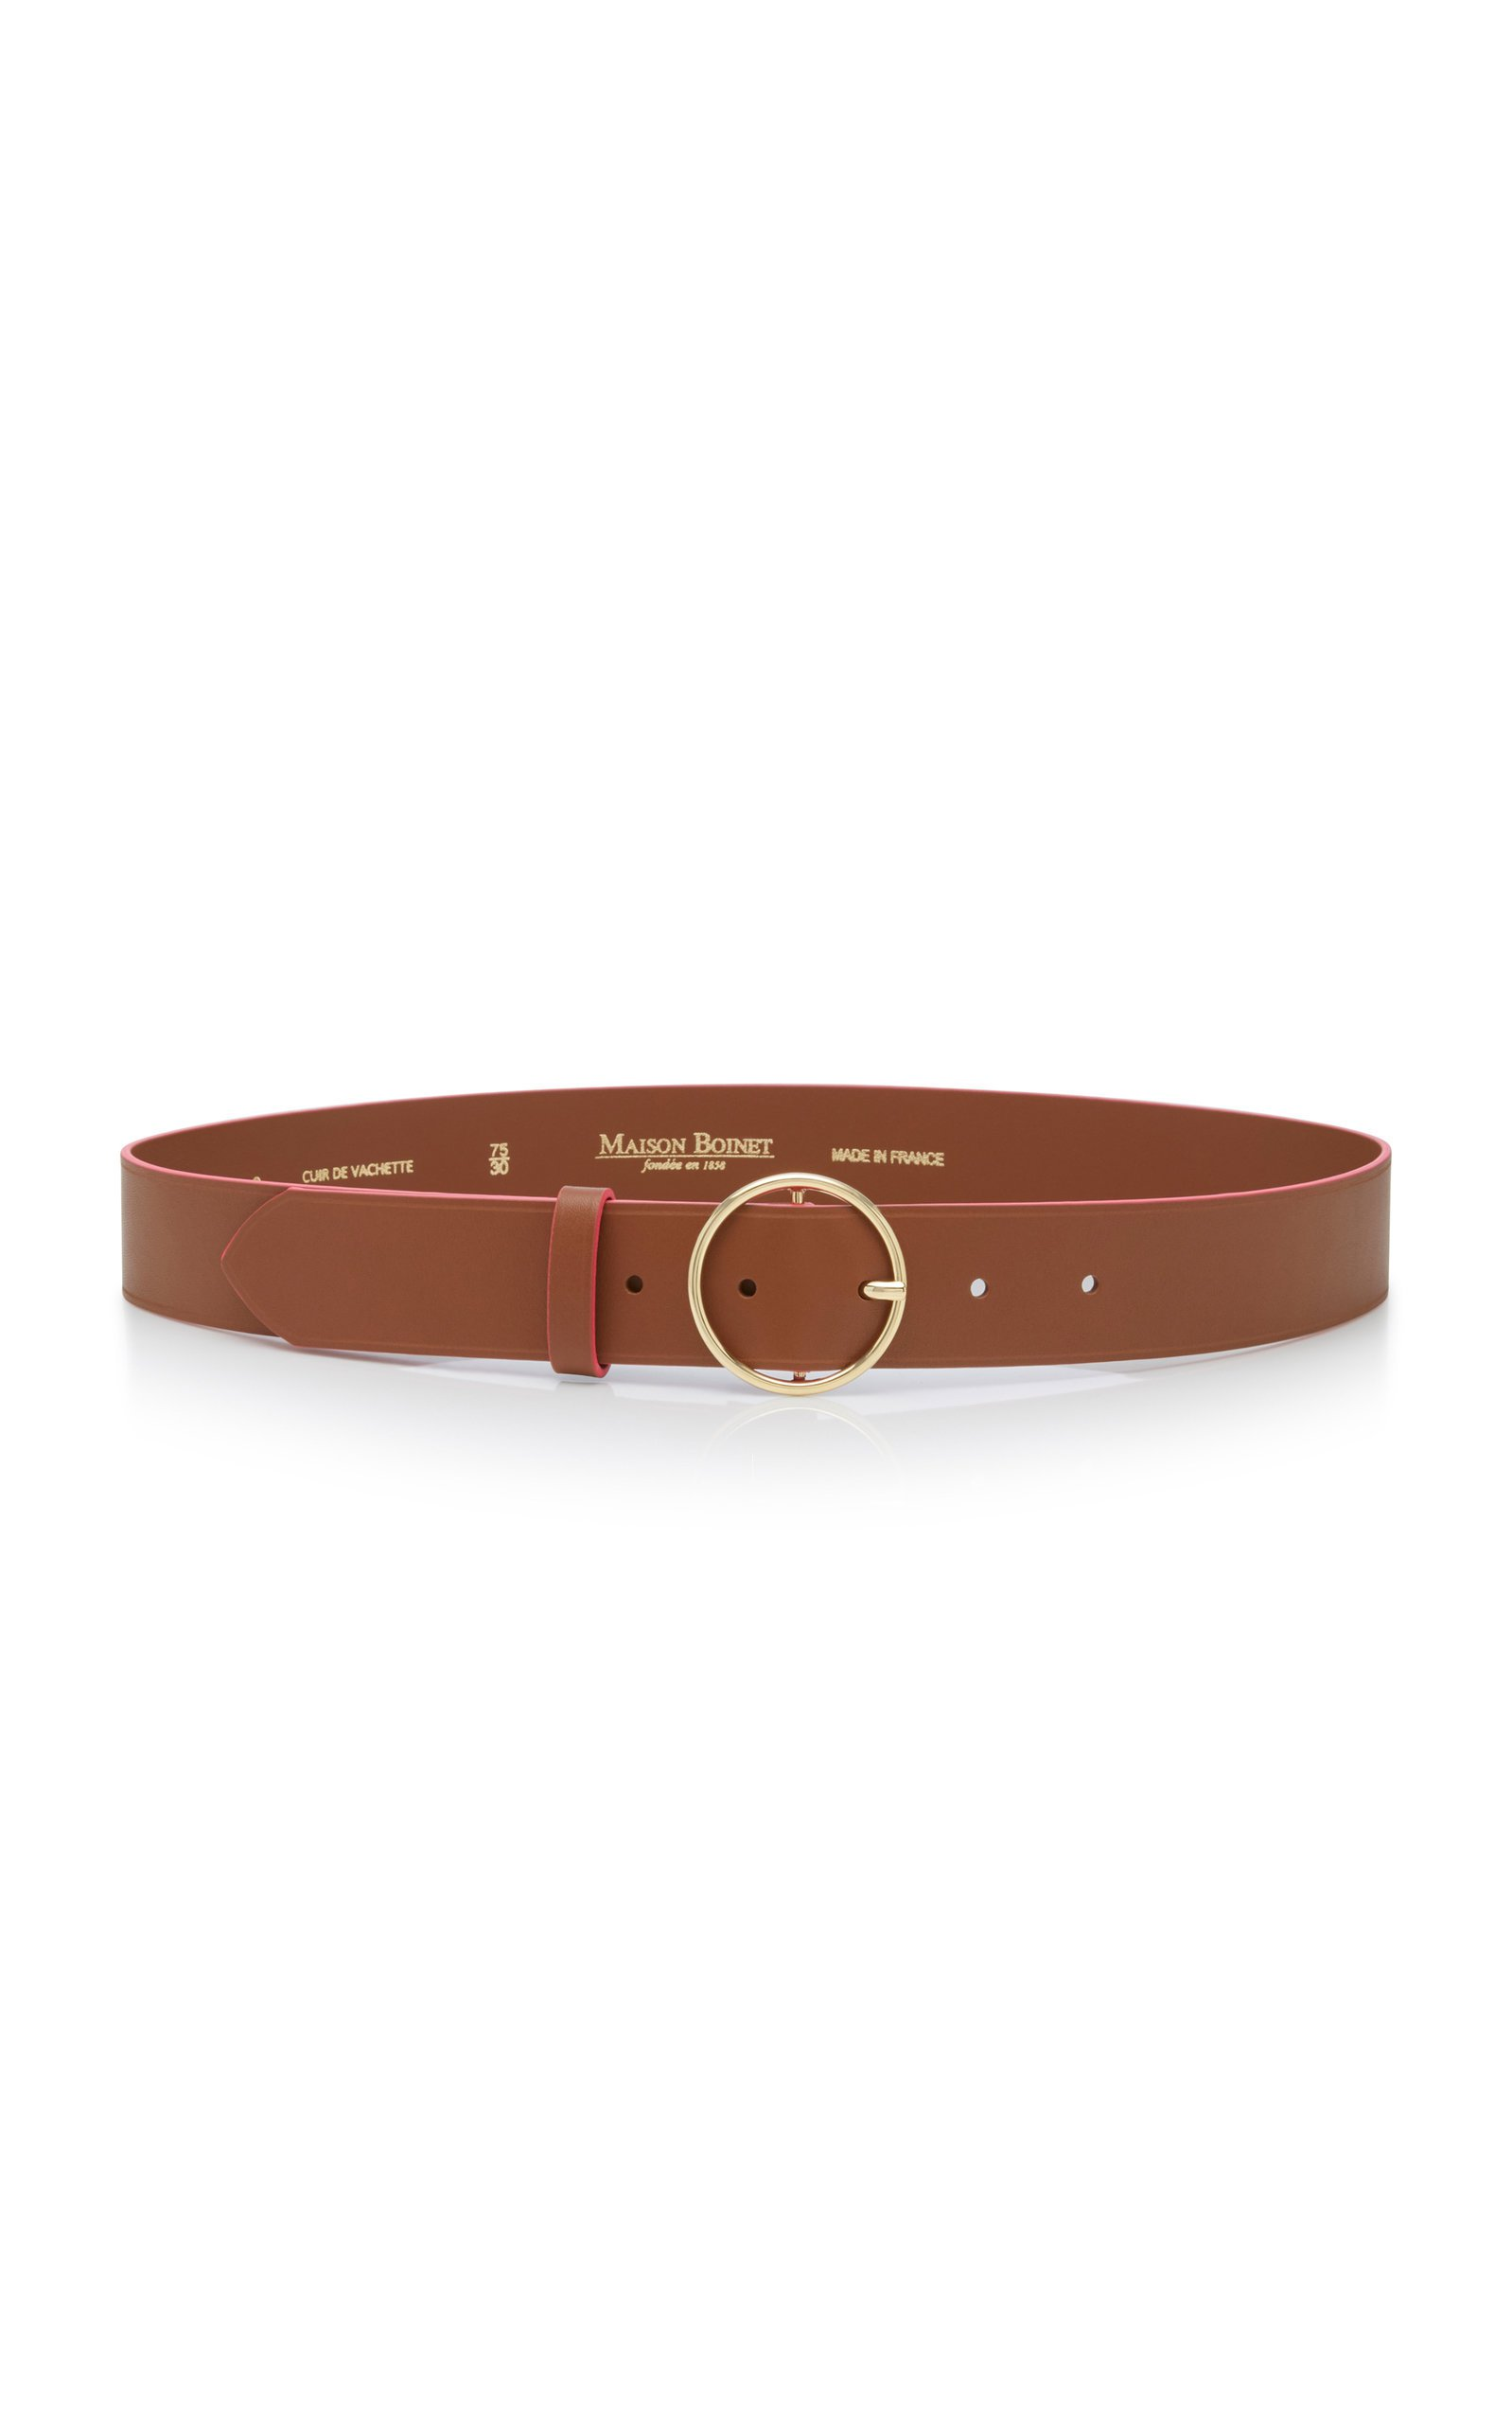 Maison Boinet Buckled Leather Belt